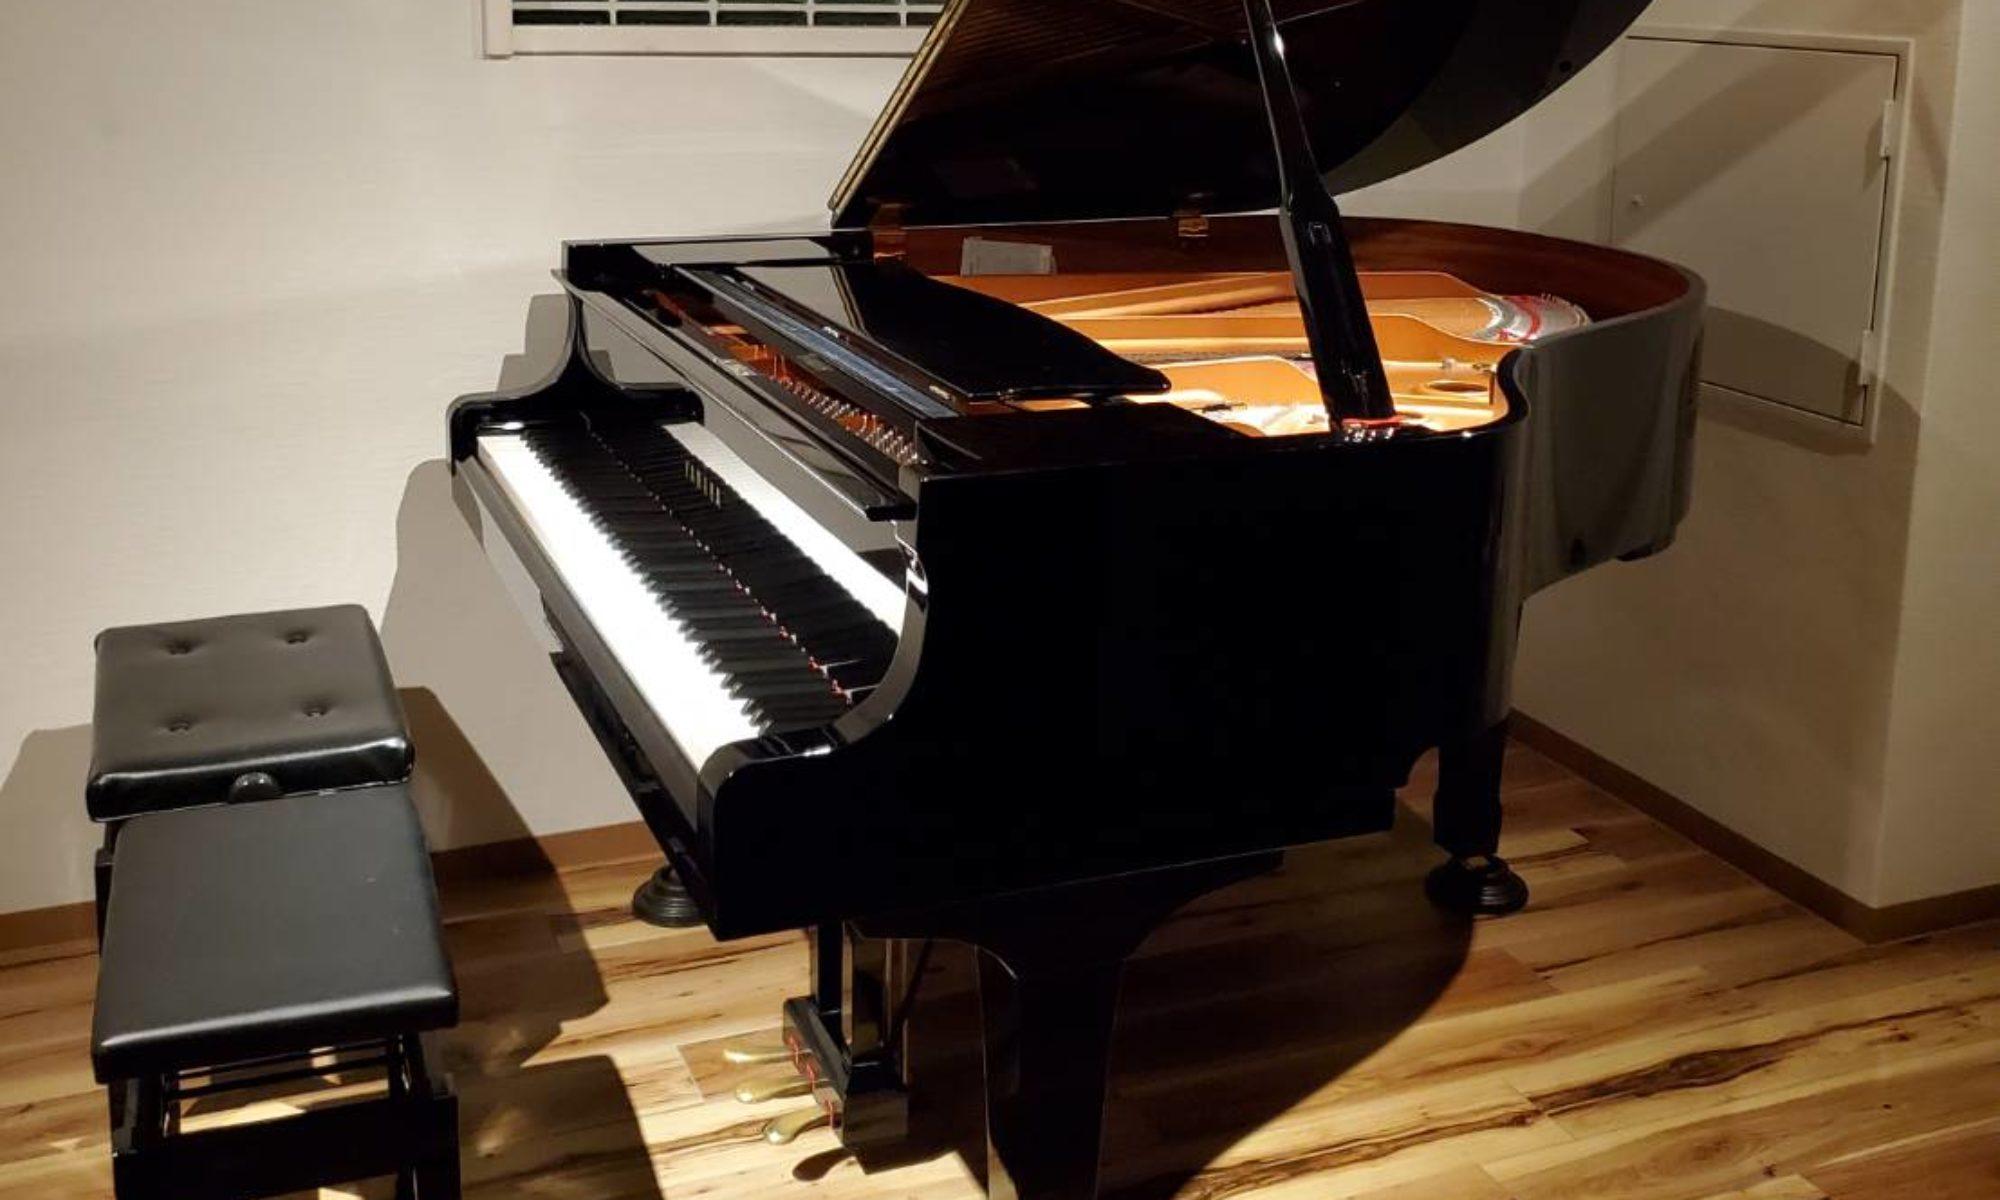 Tree Piano Studio(ツリーピアノスタジオ)尼崎市塚口・武庫之荘 グランドピアノがある貸スタジオ